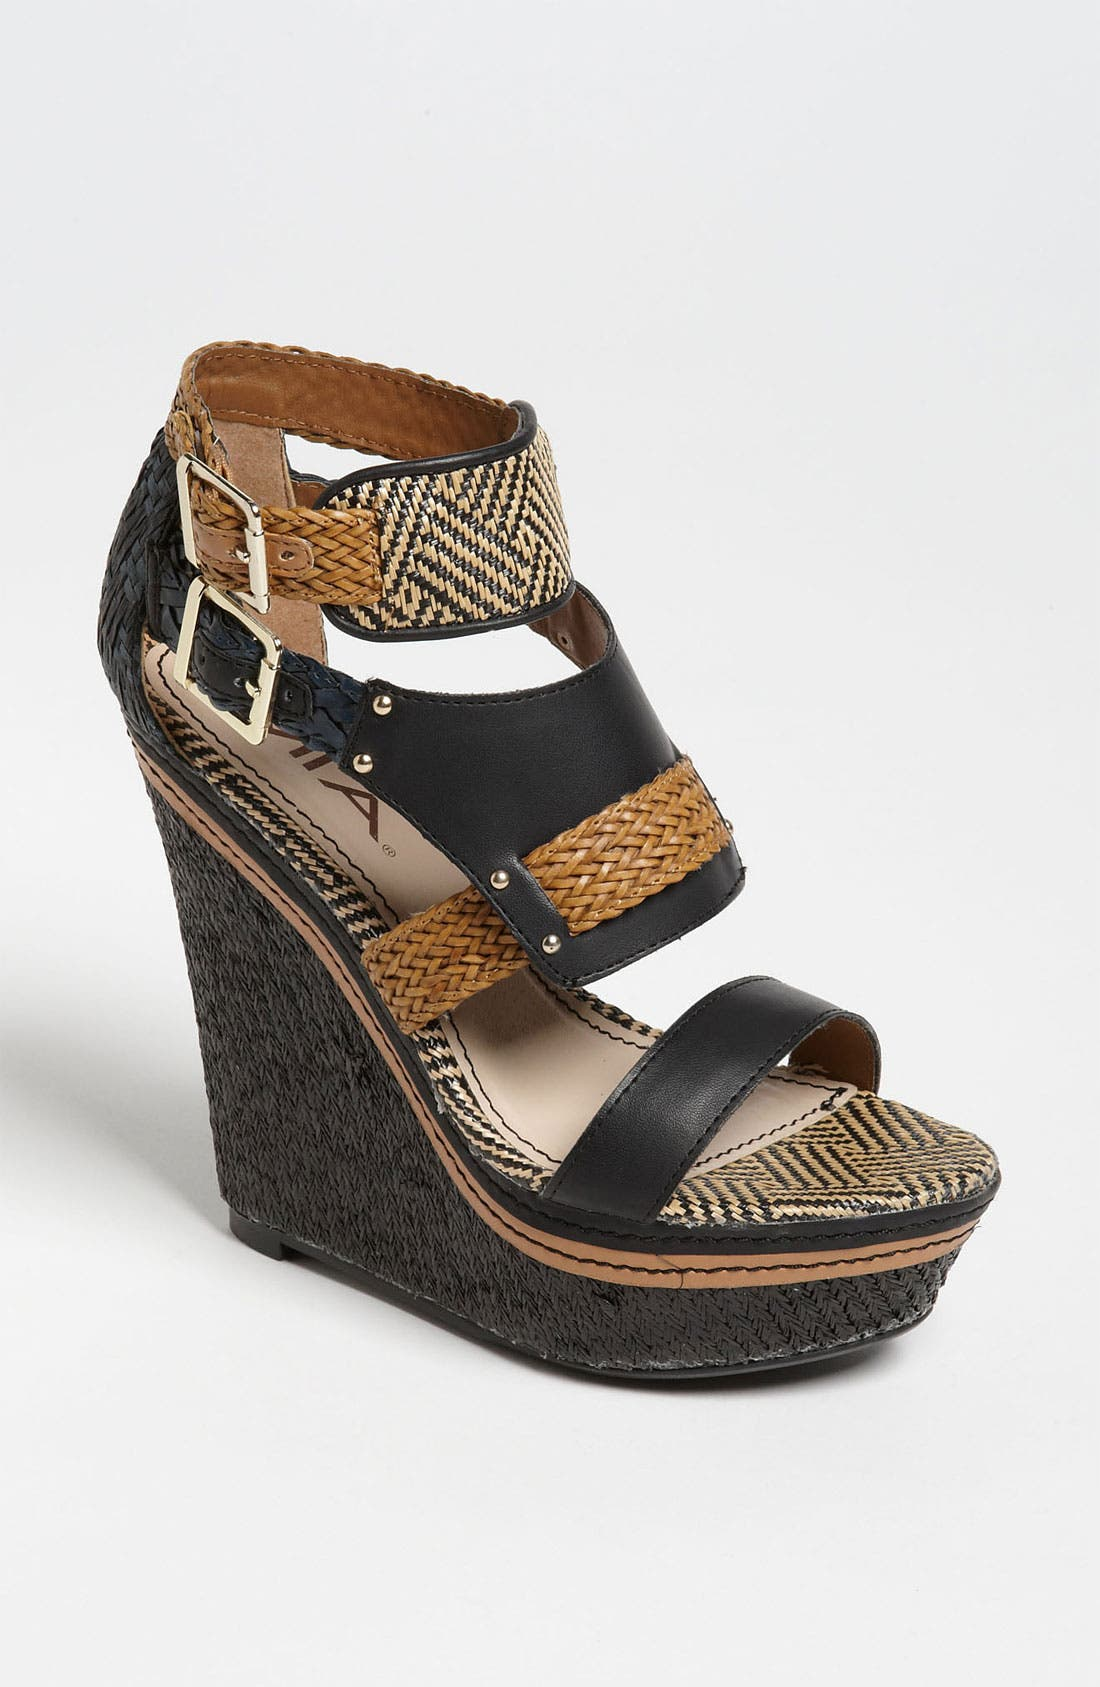 Alternate Image 1 Selected - MIA 'Frida' Wedge Sandal